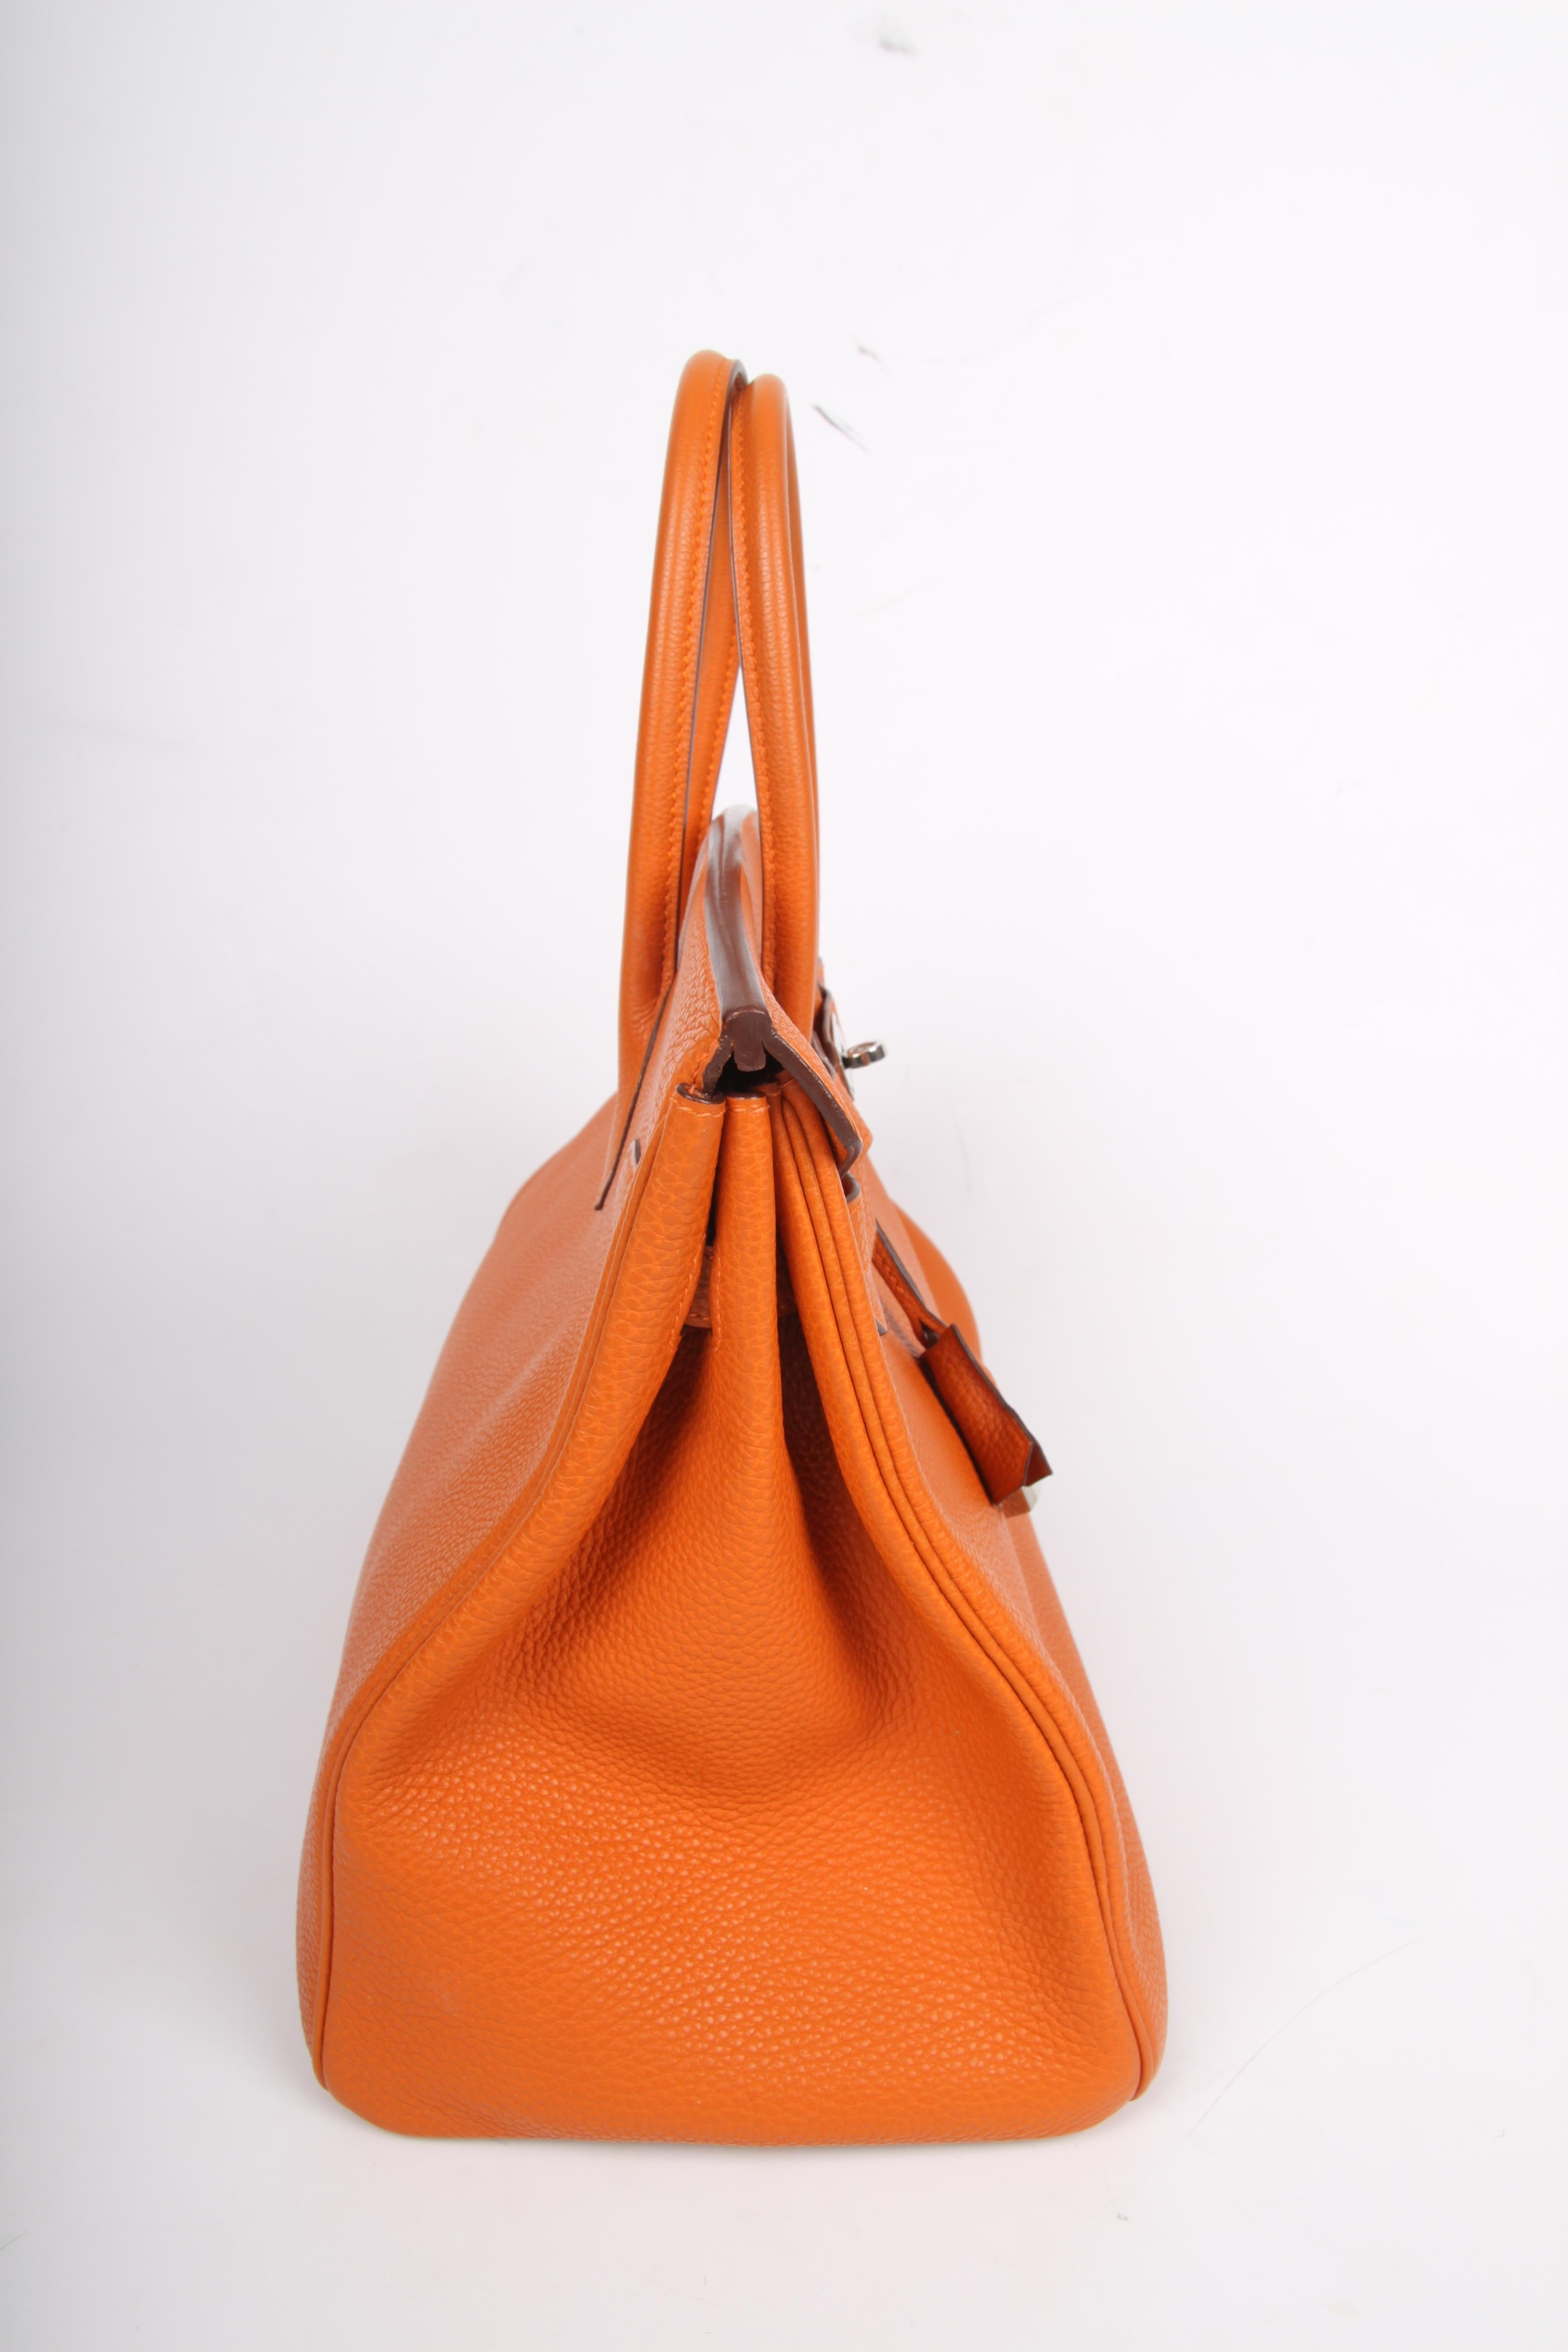 7b46d2b46d0b ... cheapest hermes birkin bag 35 togo potiron silvertone hardware for sale  3 255f9 92487